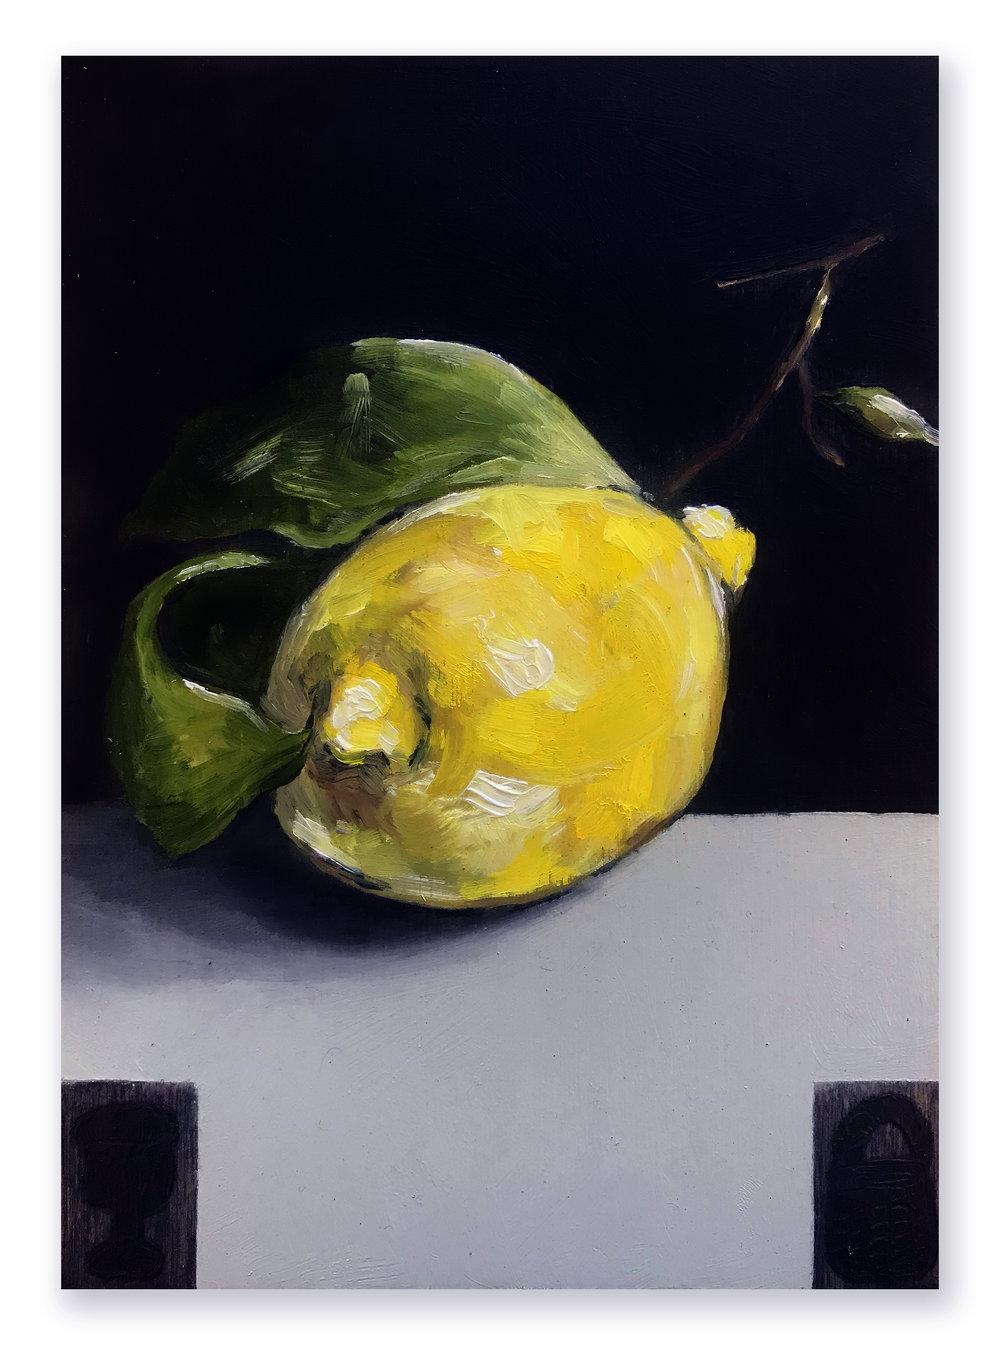 Lemon_001.jpg